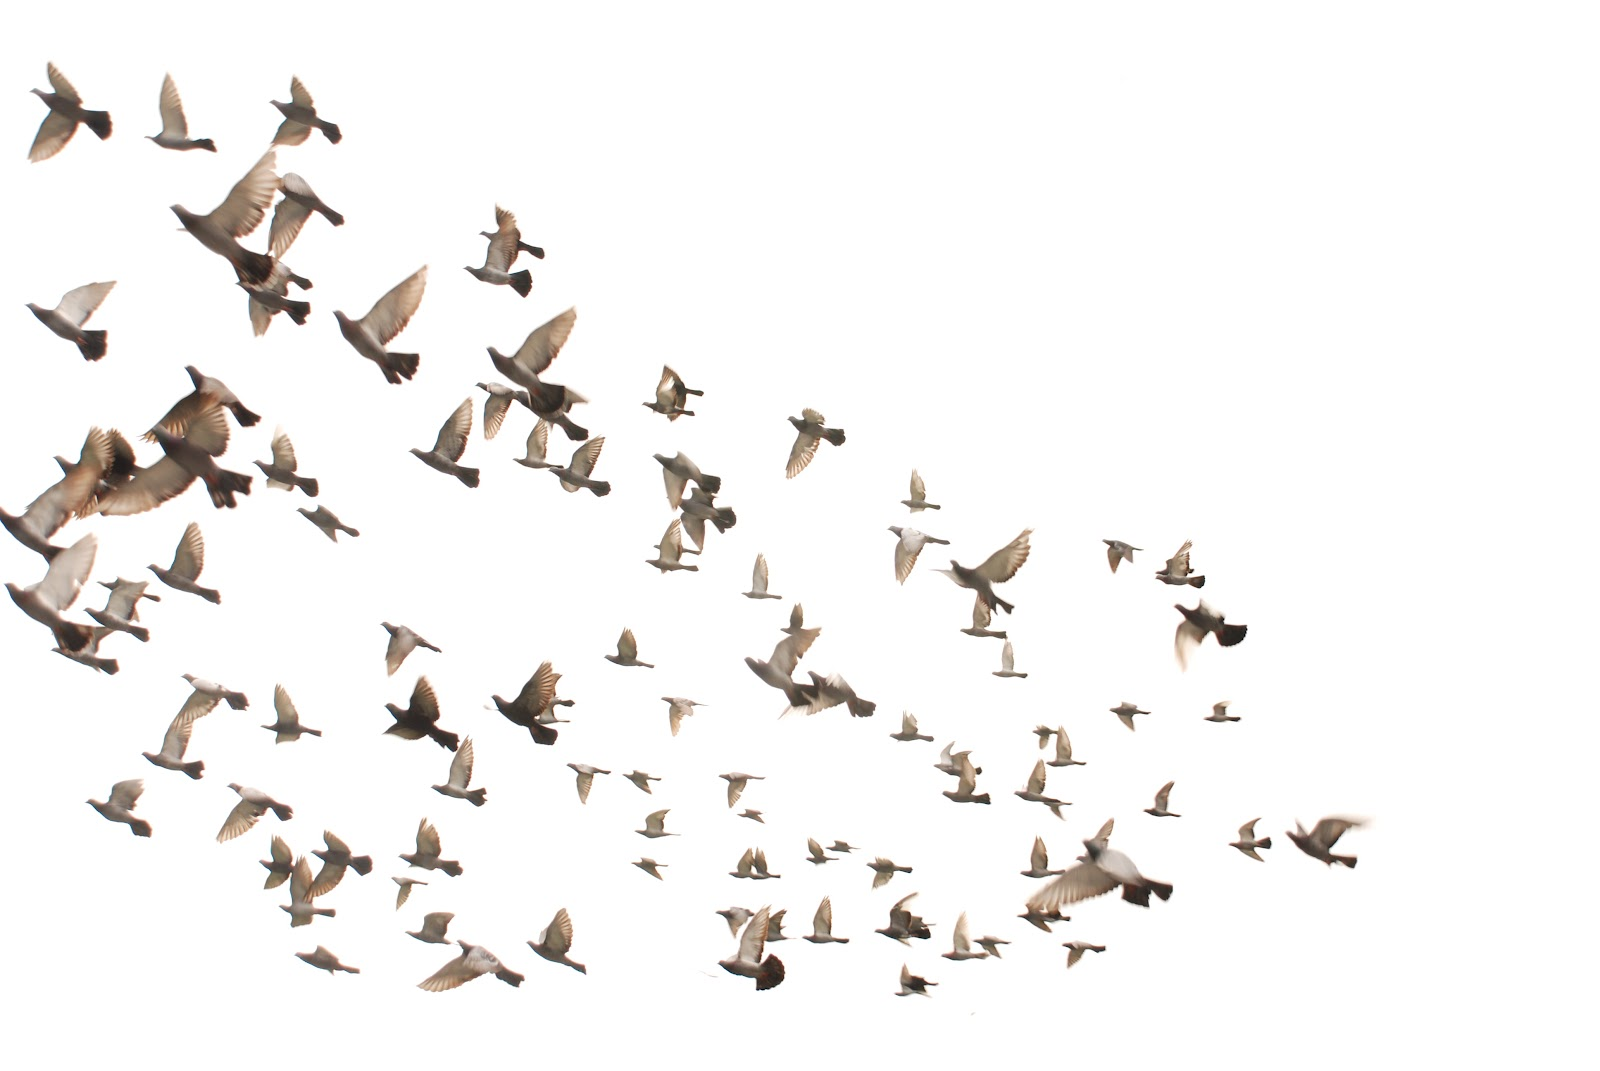 Villa Manila: Birds flying high, you know how I feel..... - photo#5